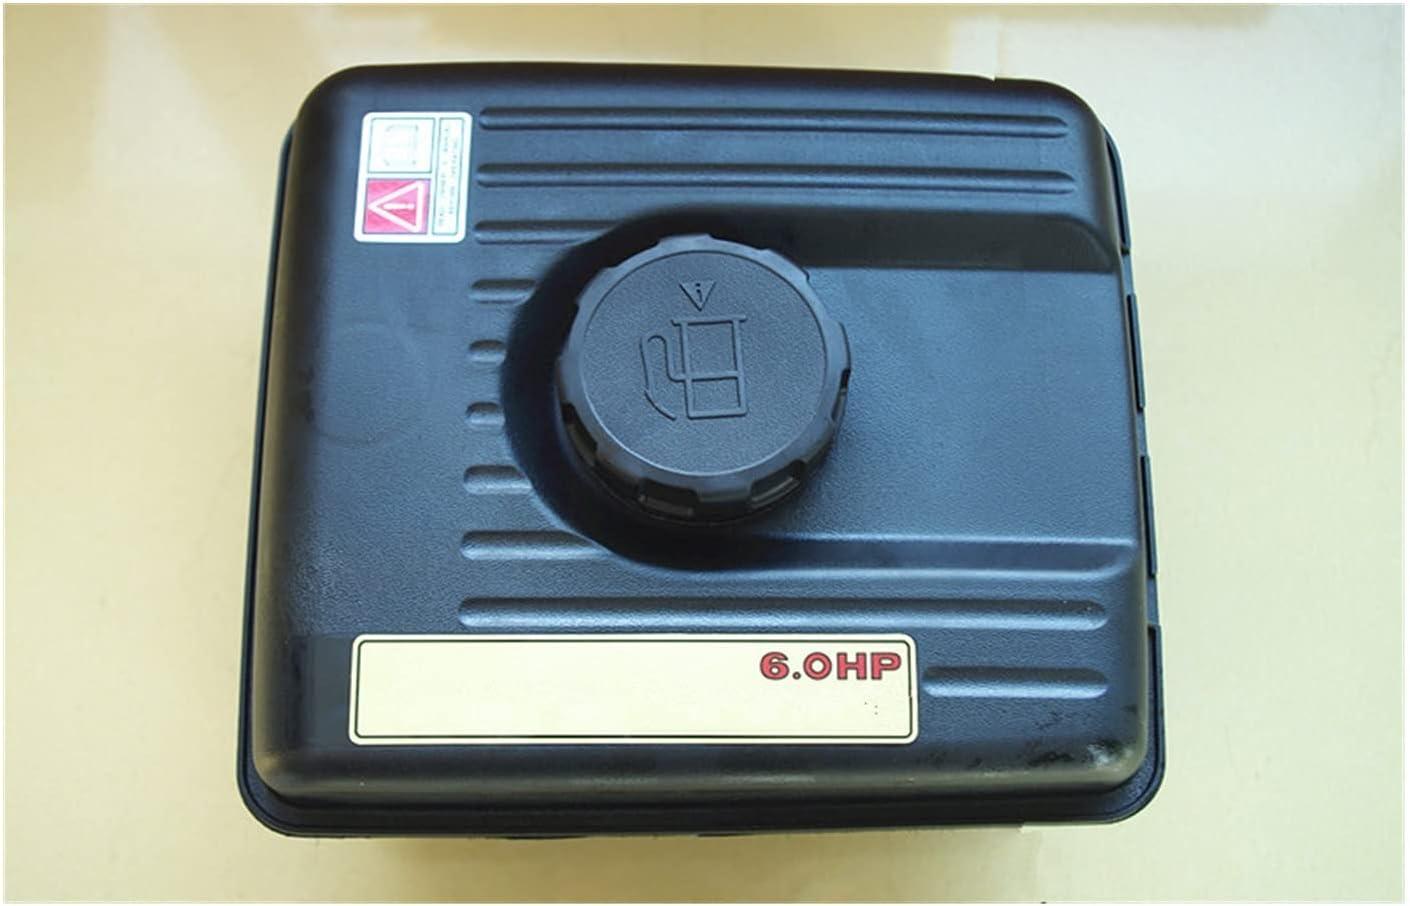 ZHFEN Genuine Fuel discount Tank Assembly Black Plastic Miami Mall Compatible with